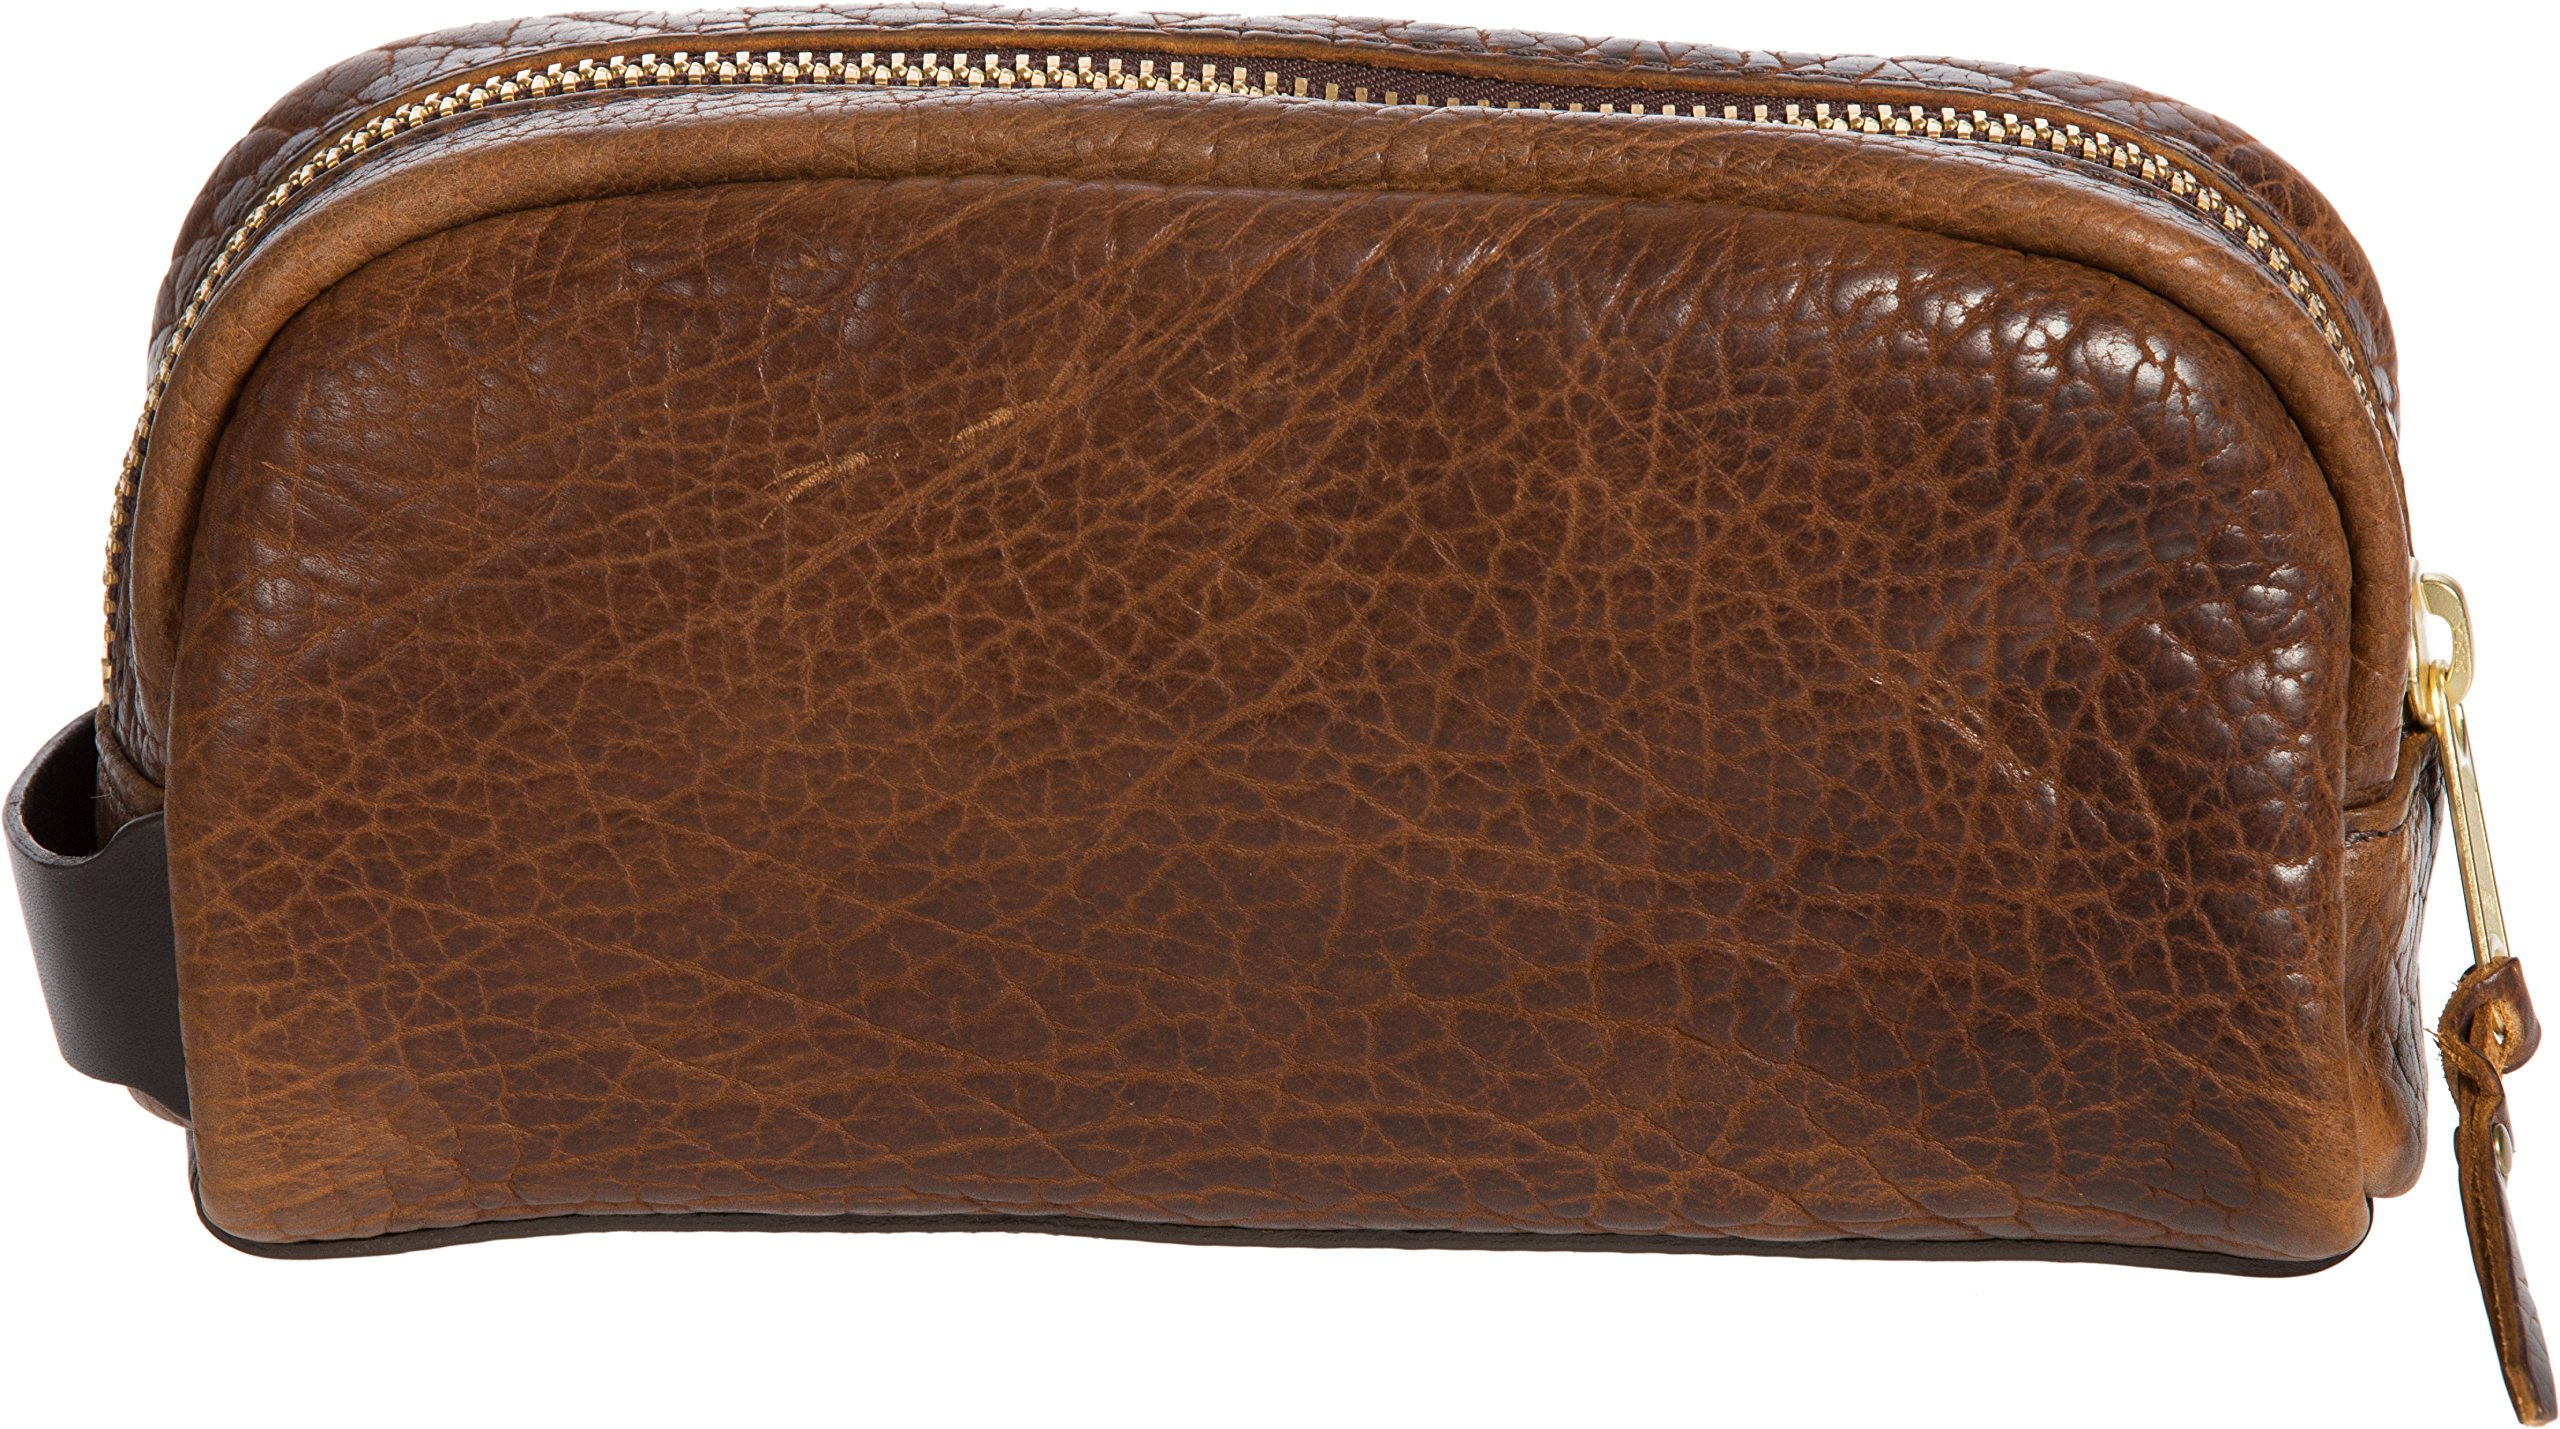 American Bison Leather Medium Travel Kit